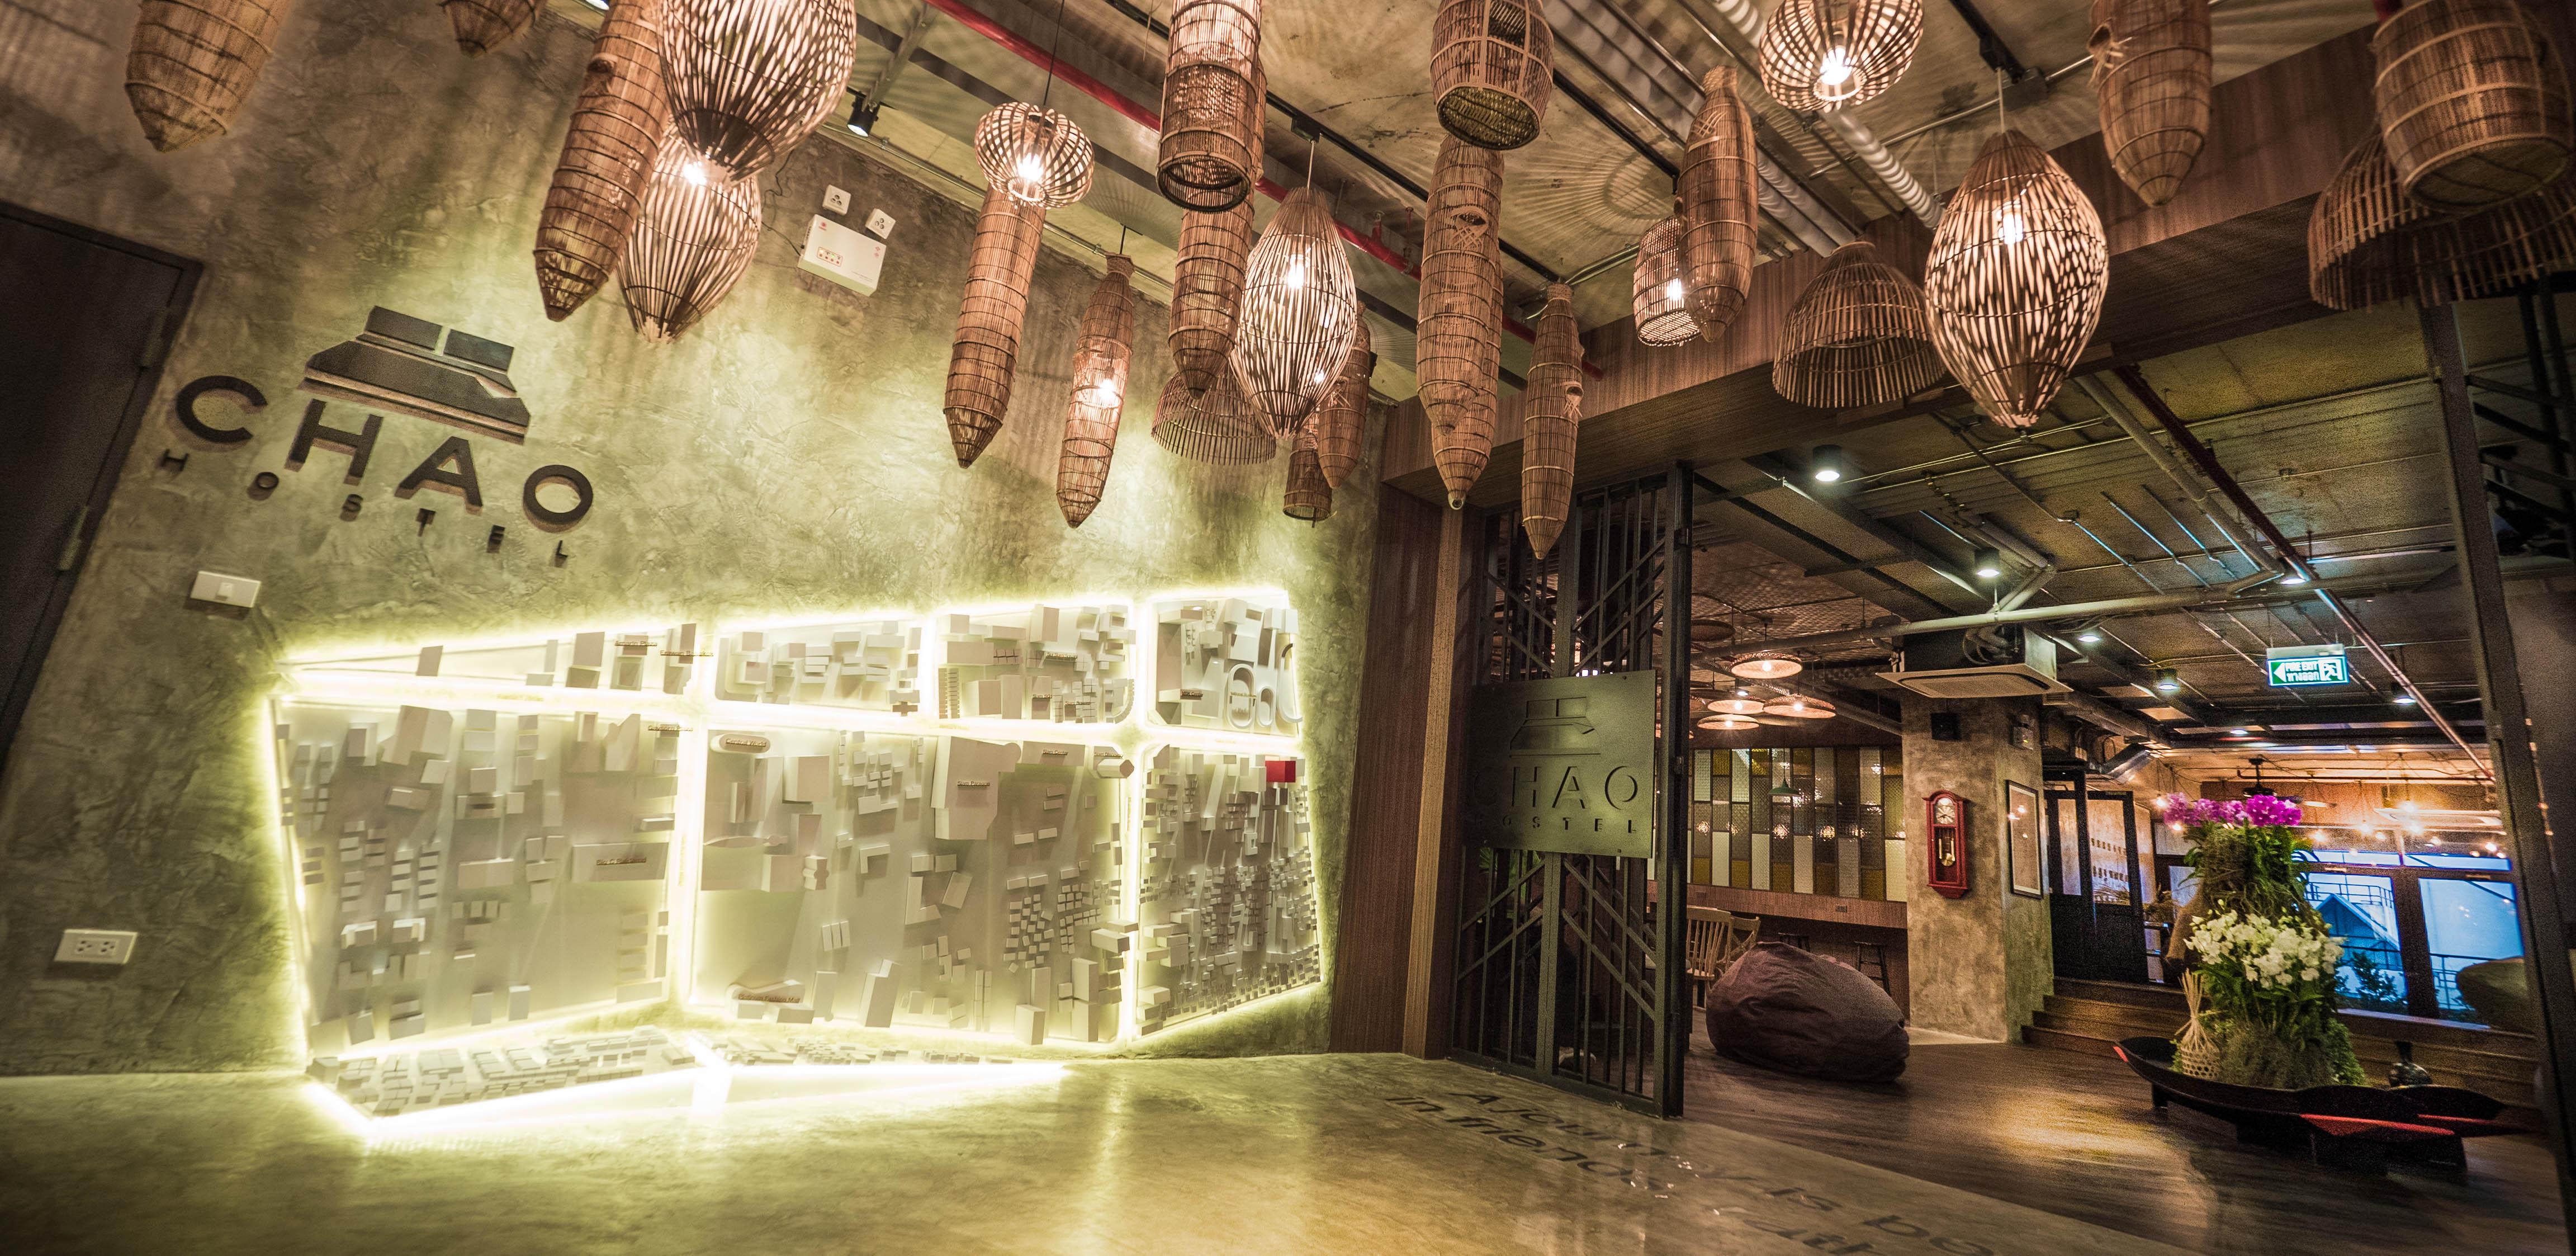 Chao Hostel: Bangkok's Premier Thai Experience